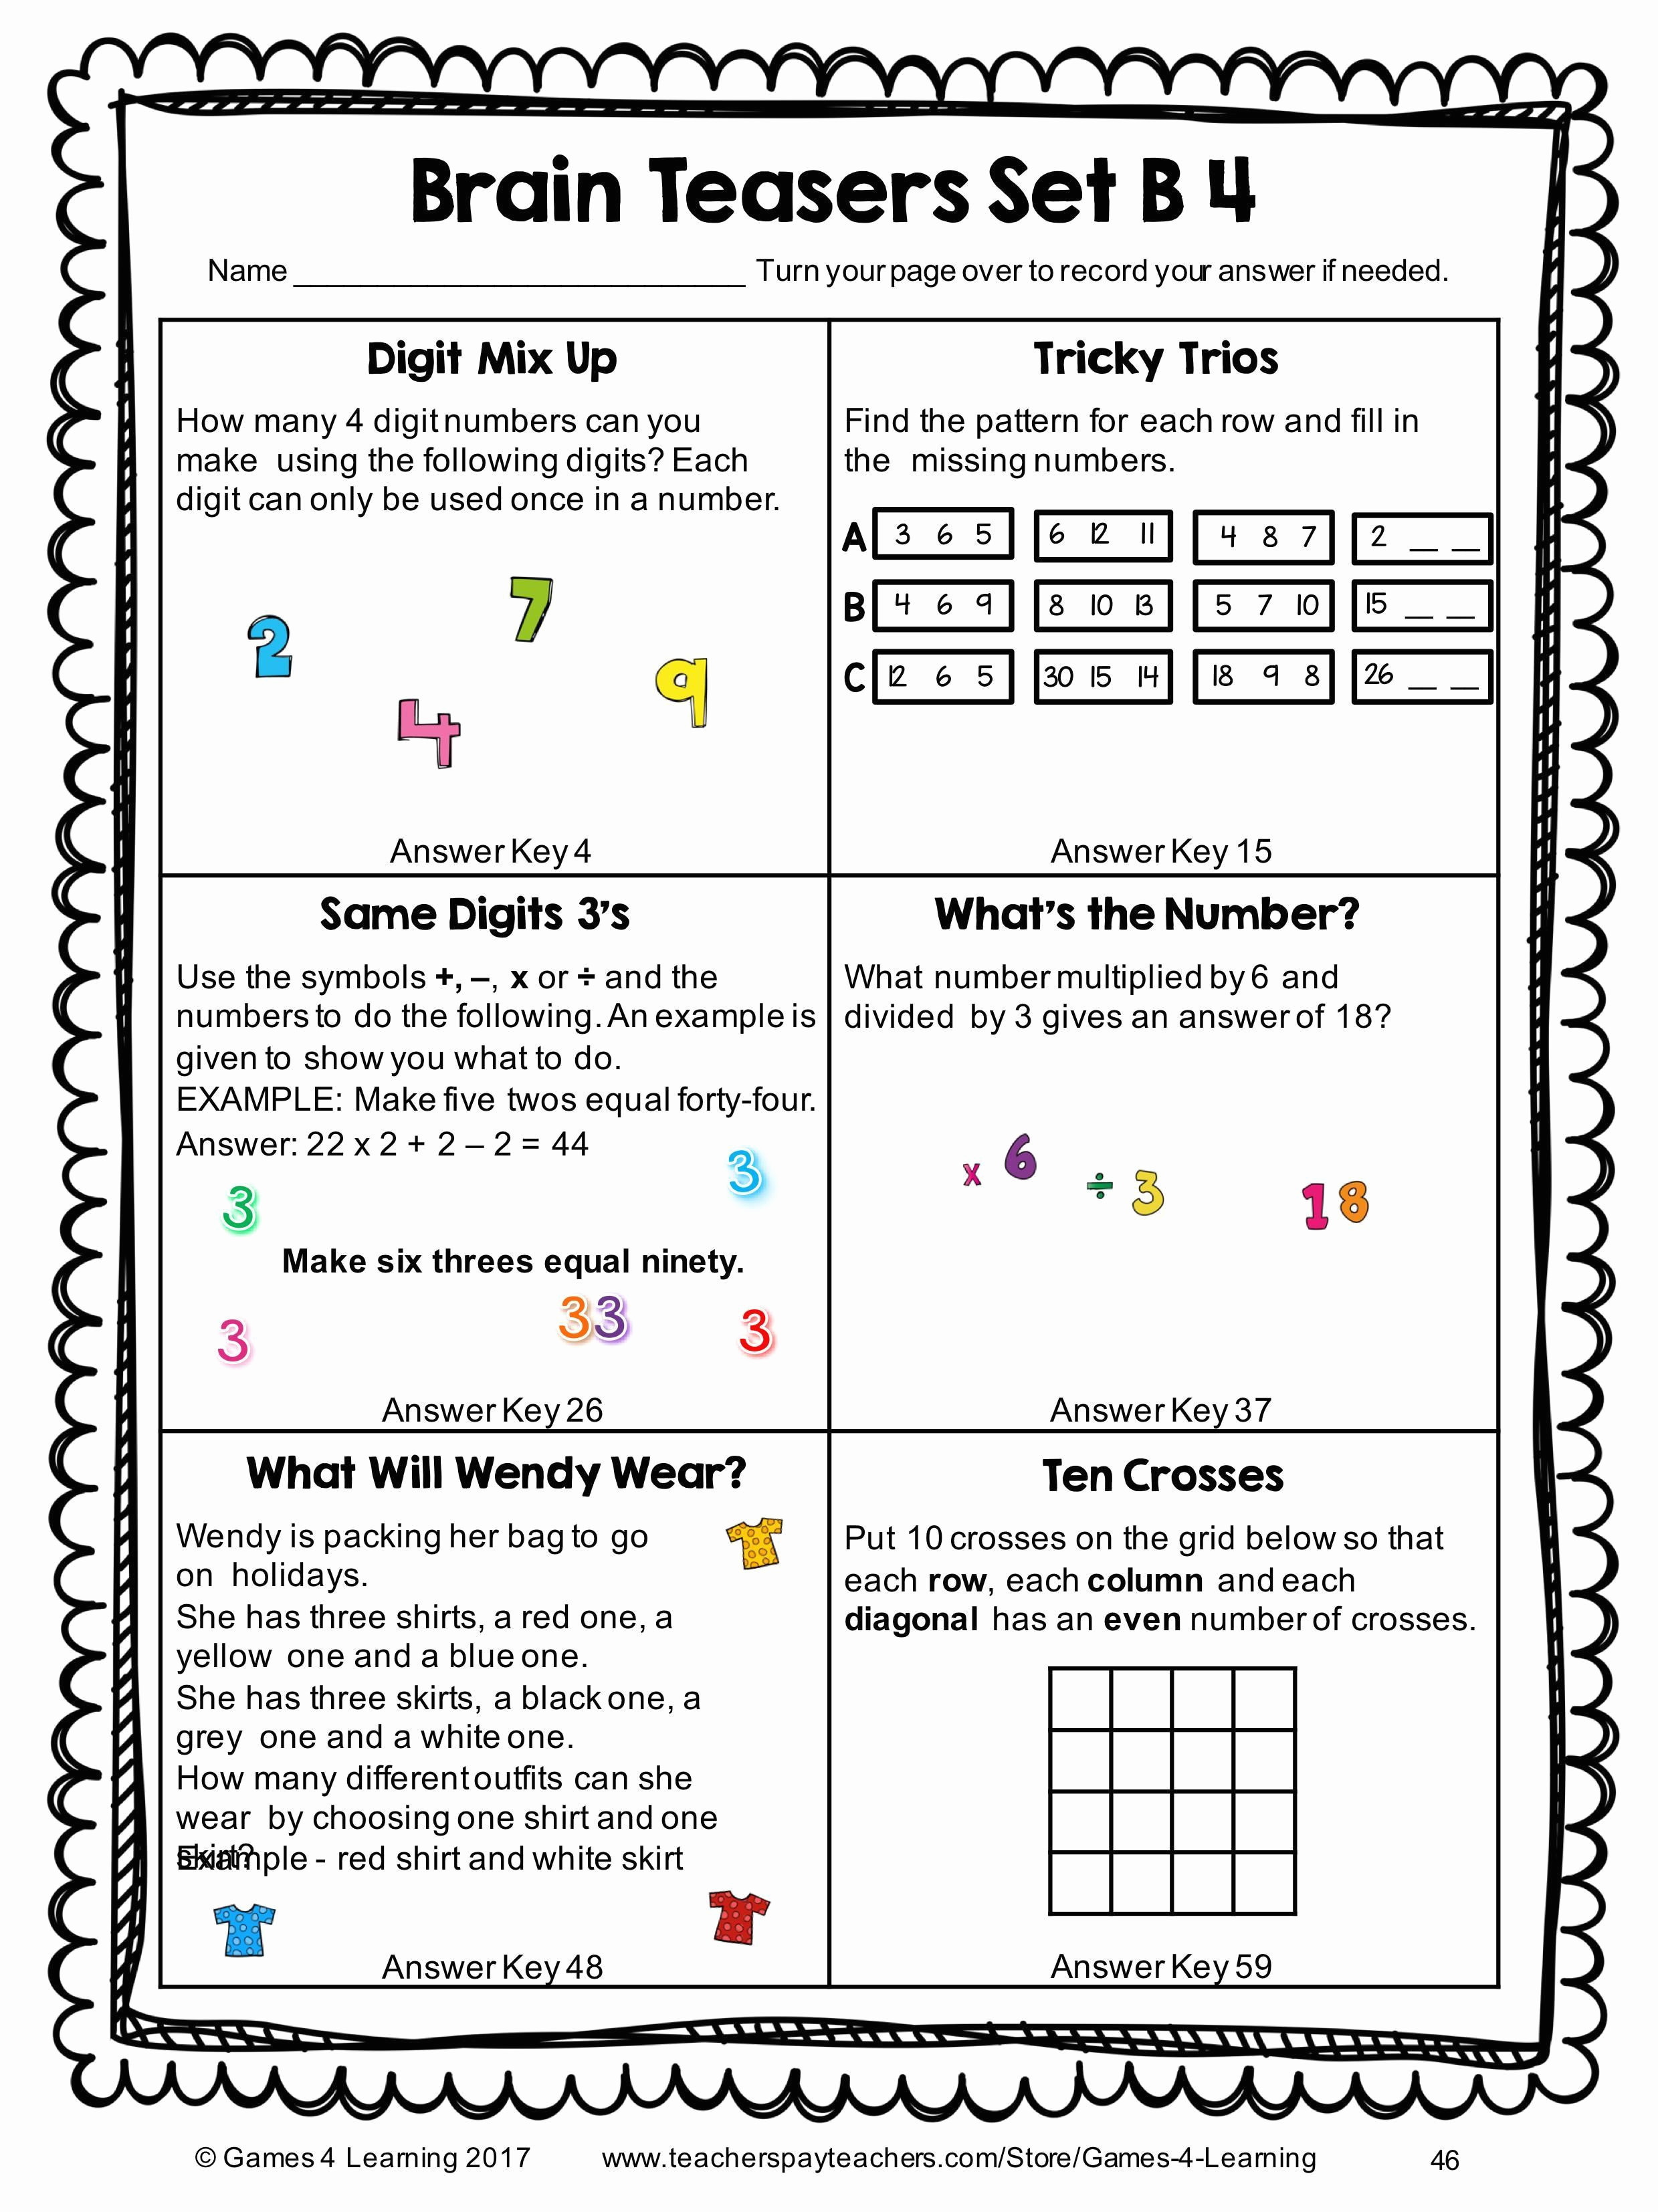 Brain Teaser Printable Worksheets 6th Grade Brain Teasers Worksheets